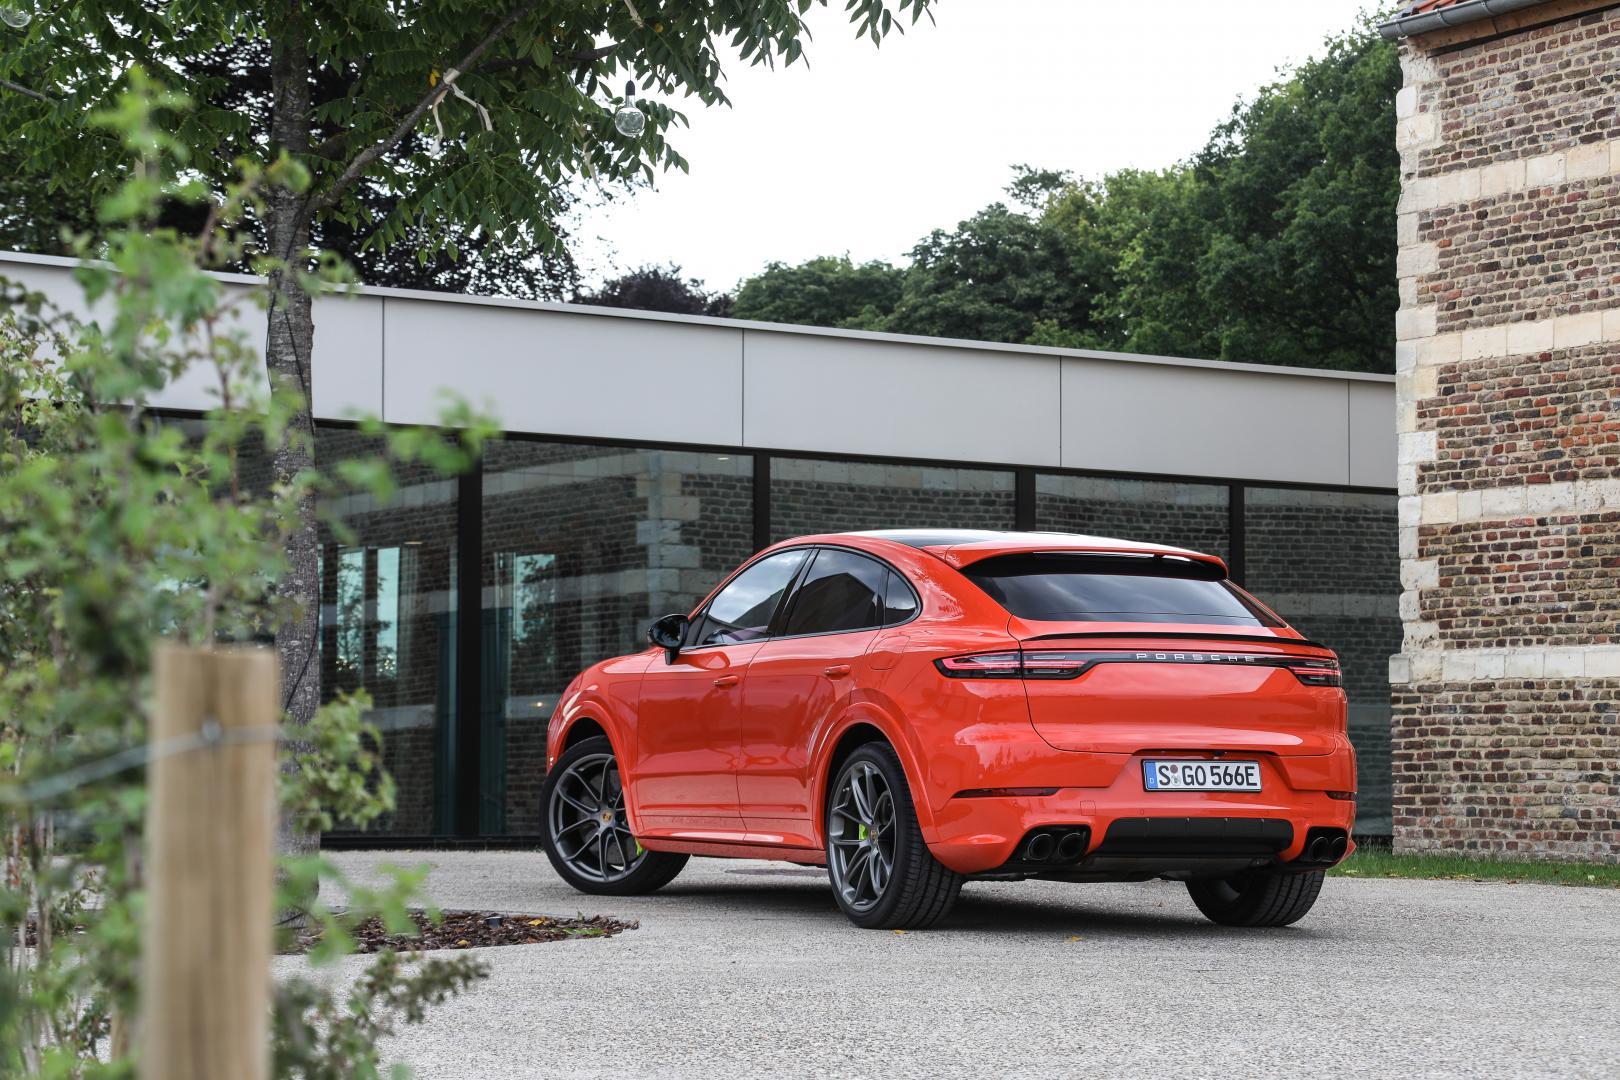 Porsche Cayenne Turbo S E-Hybrid Coupe Oranje